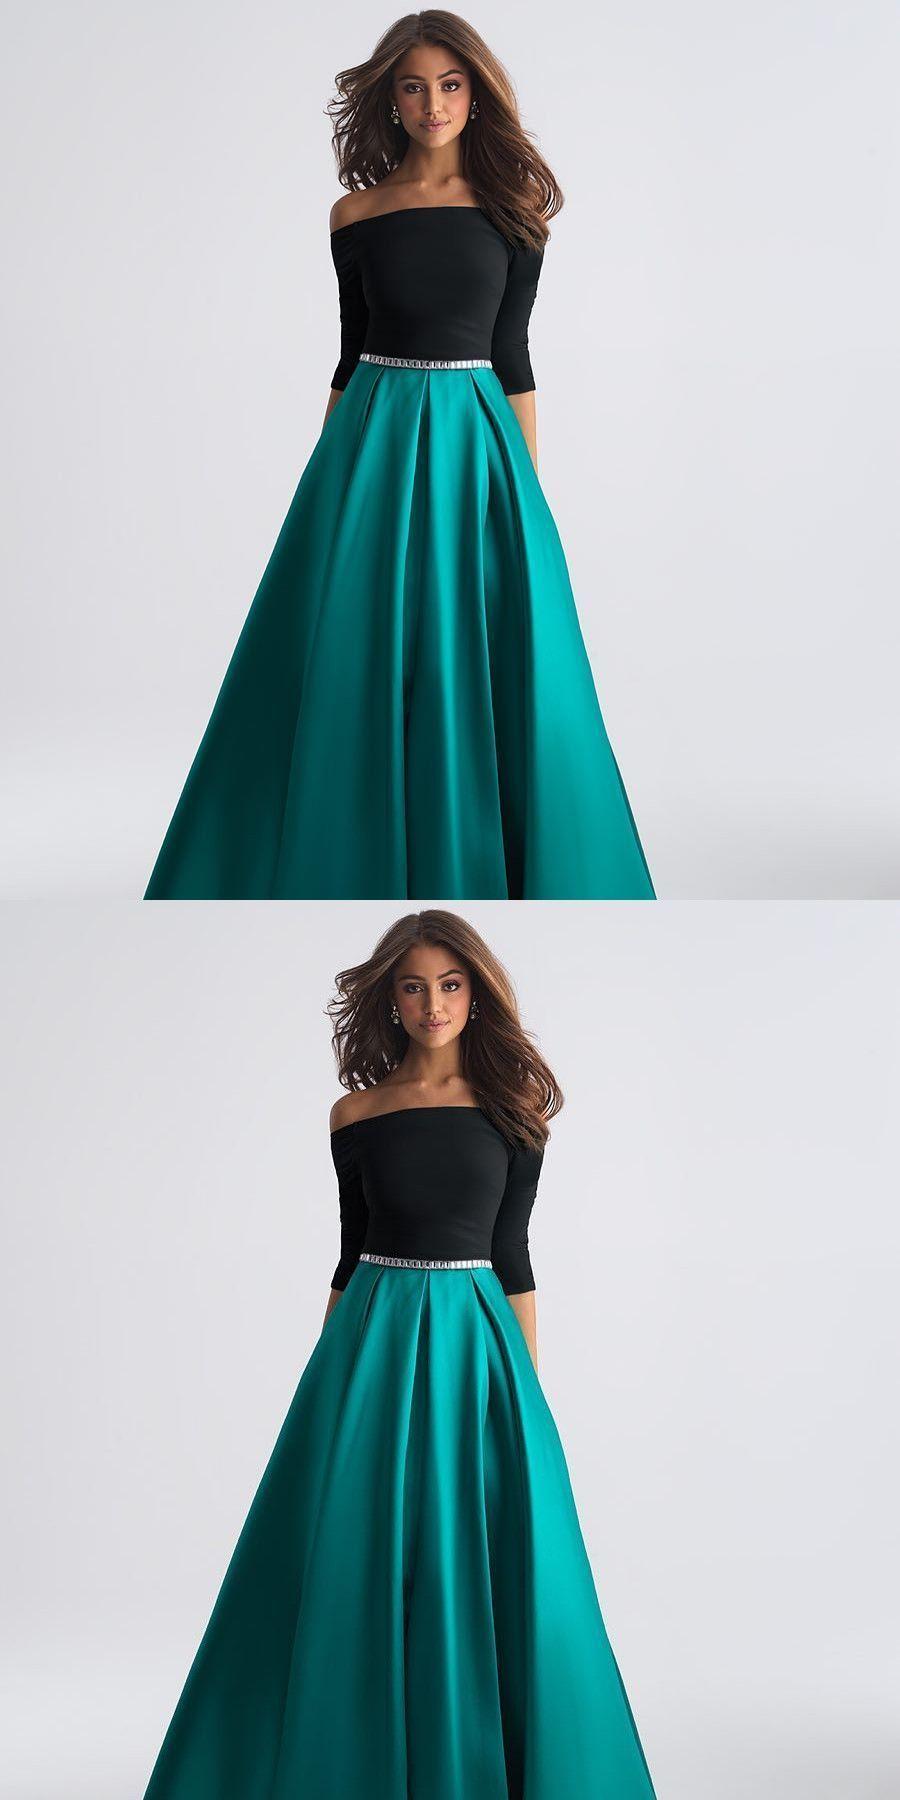 Prom dresses longprom dresses modestprom dresses simpleprom